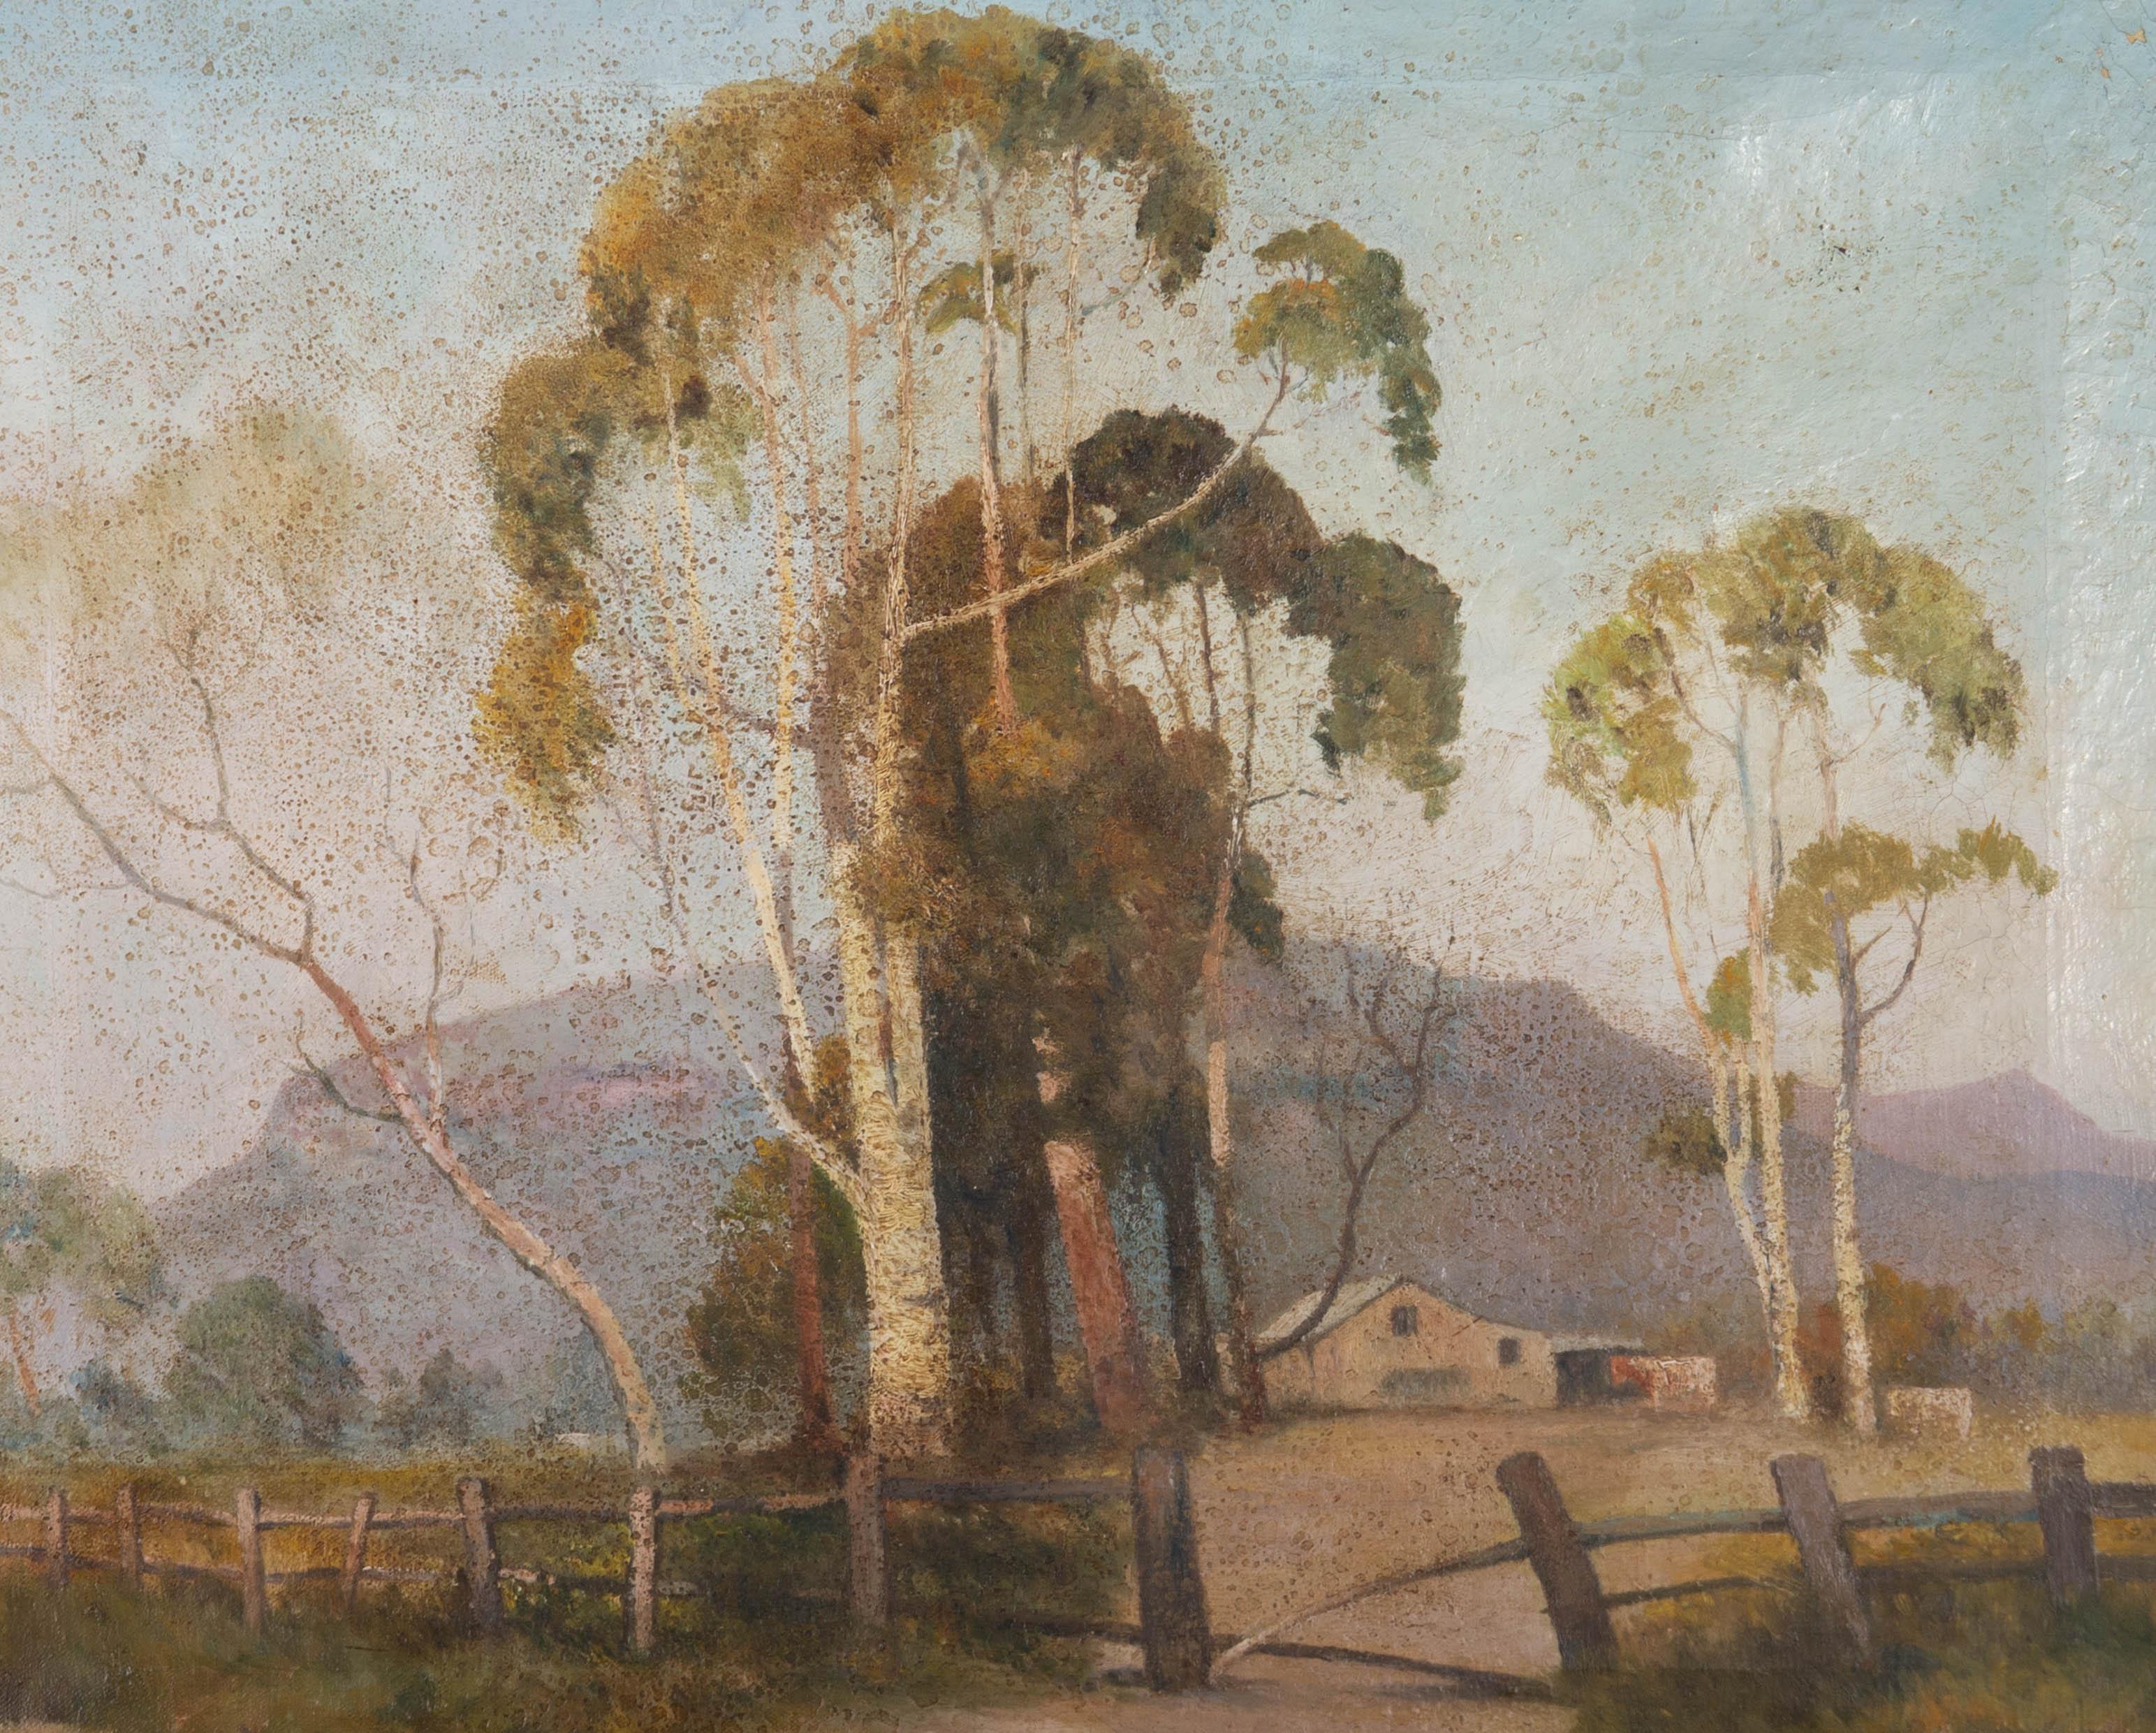 For Restoration - Mid 20th Century Oil - Rural Farm